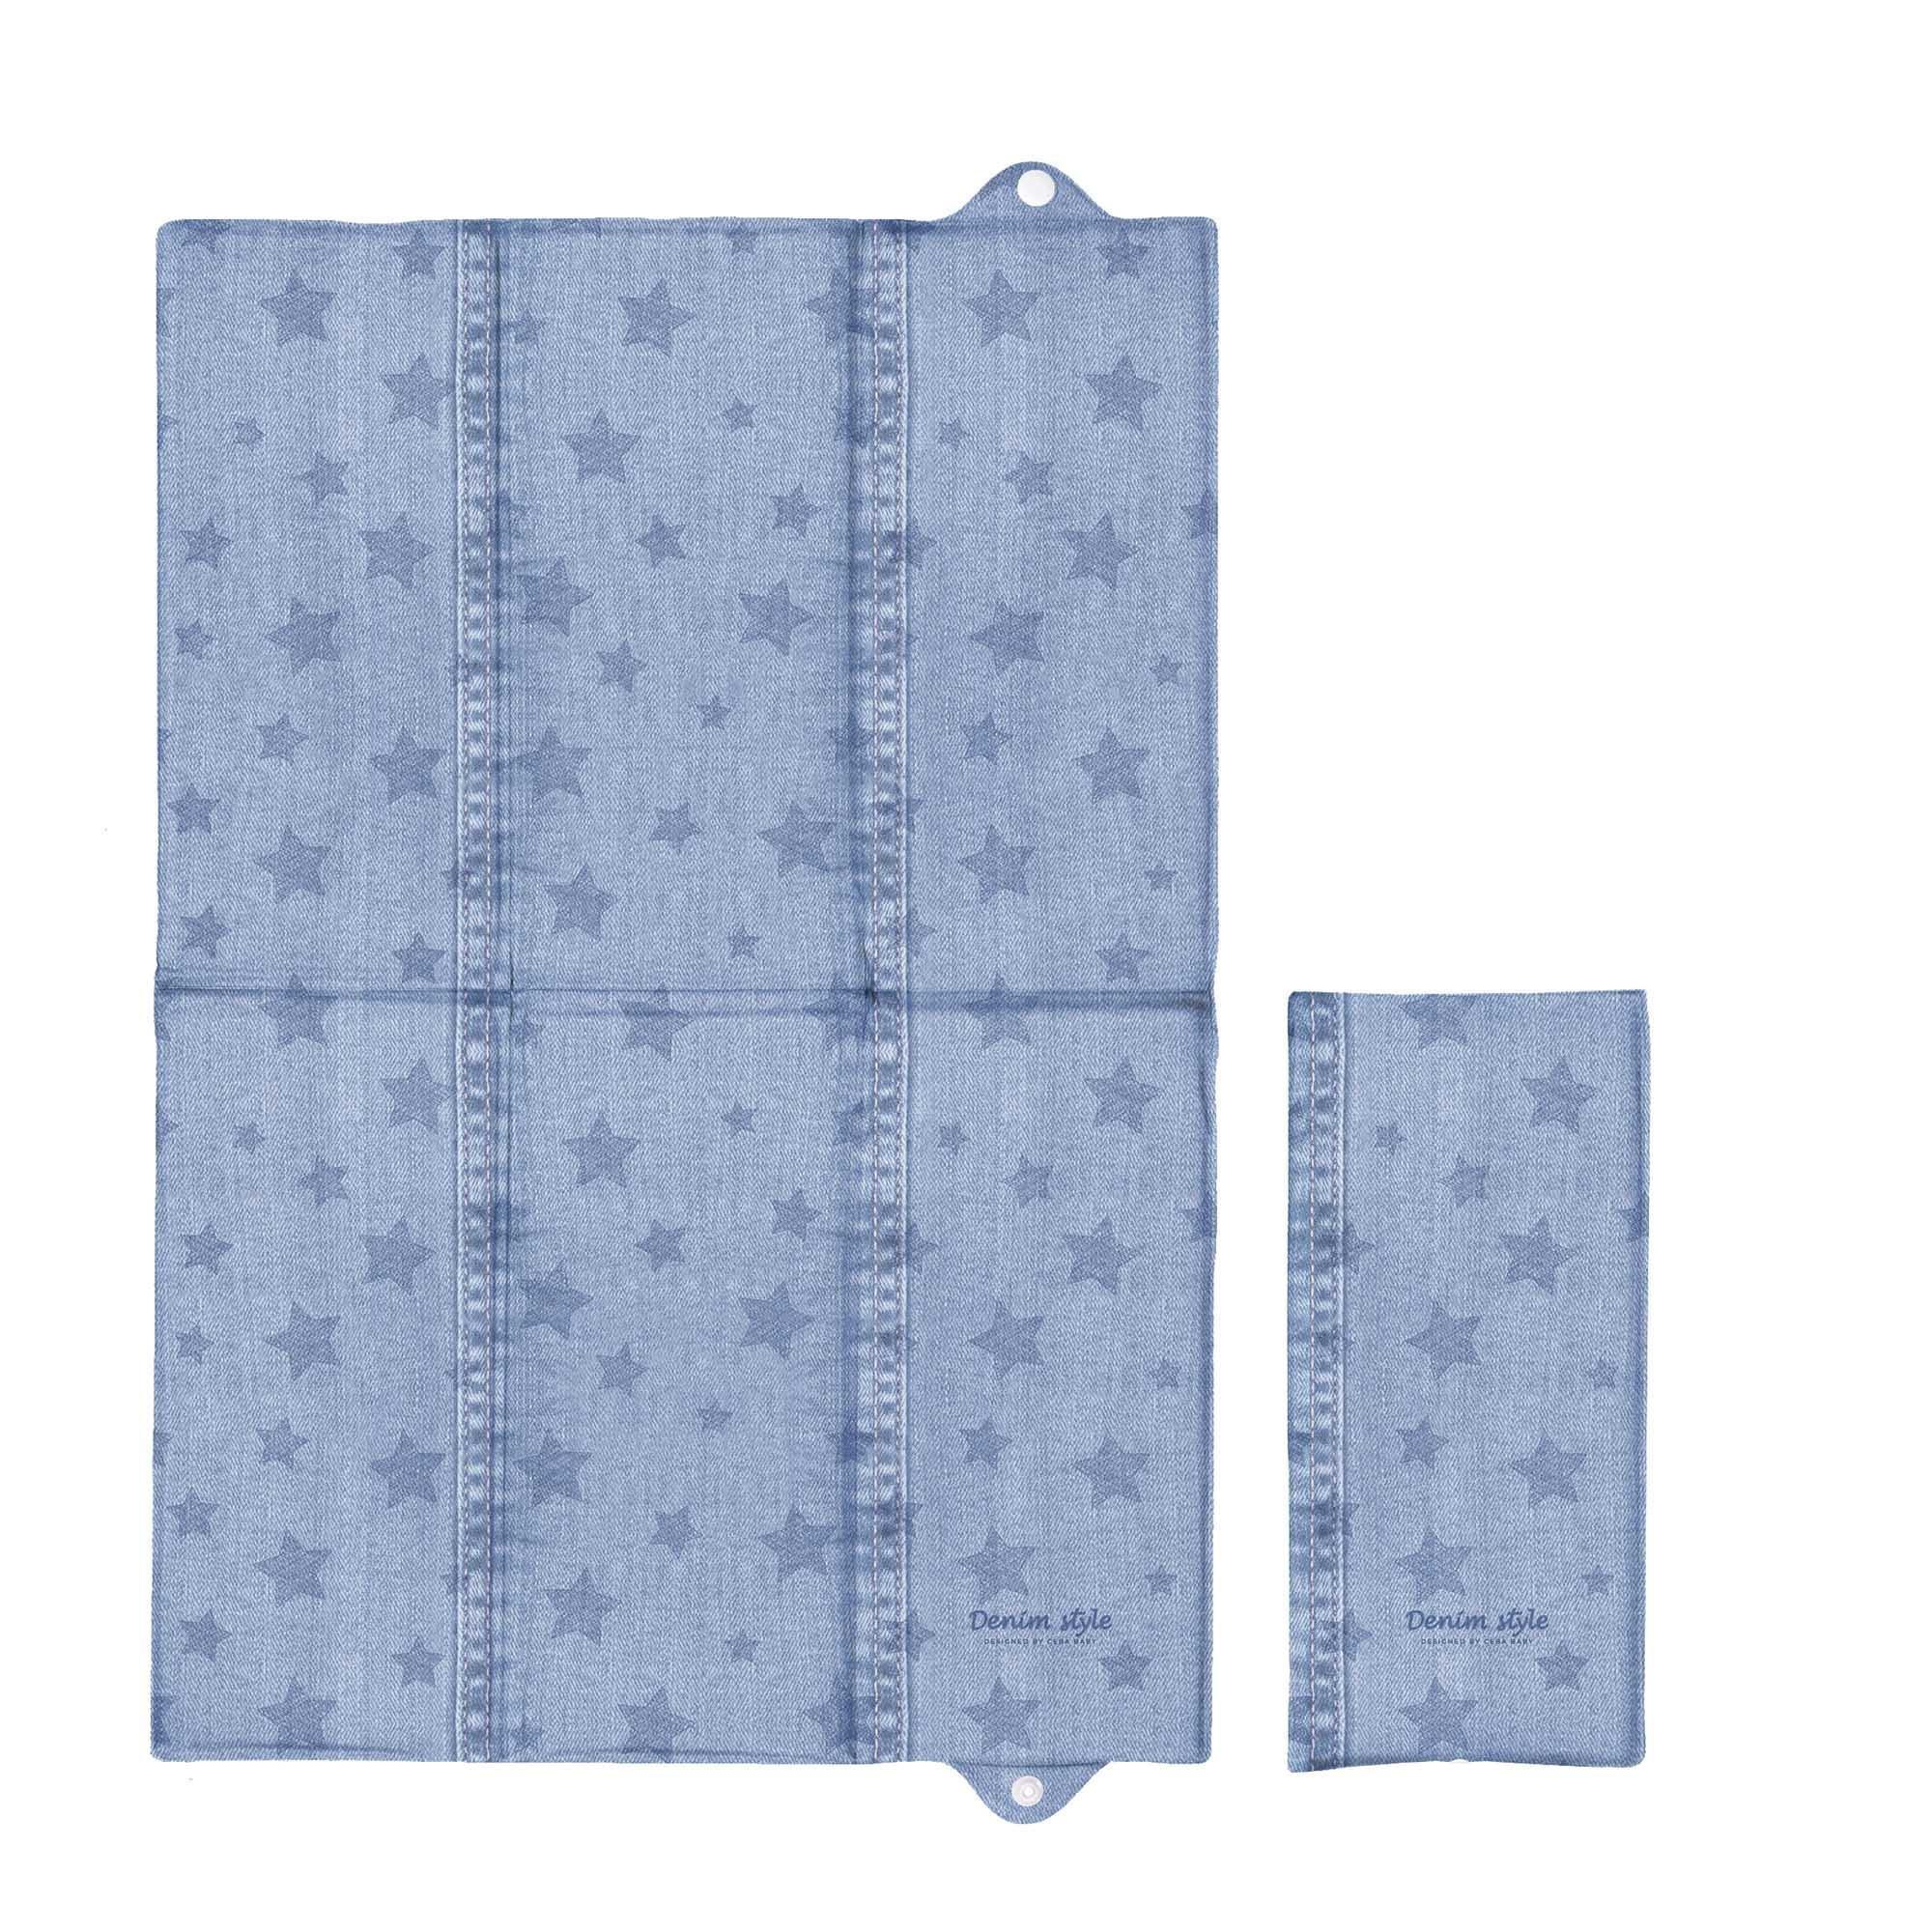 Cestovn� preba�ovacia podlo�ka Denim style Hviezdy modr� 40x60 cm - zv��i� obr�zok